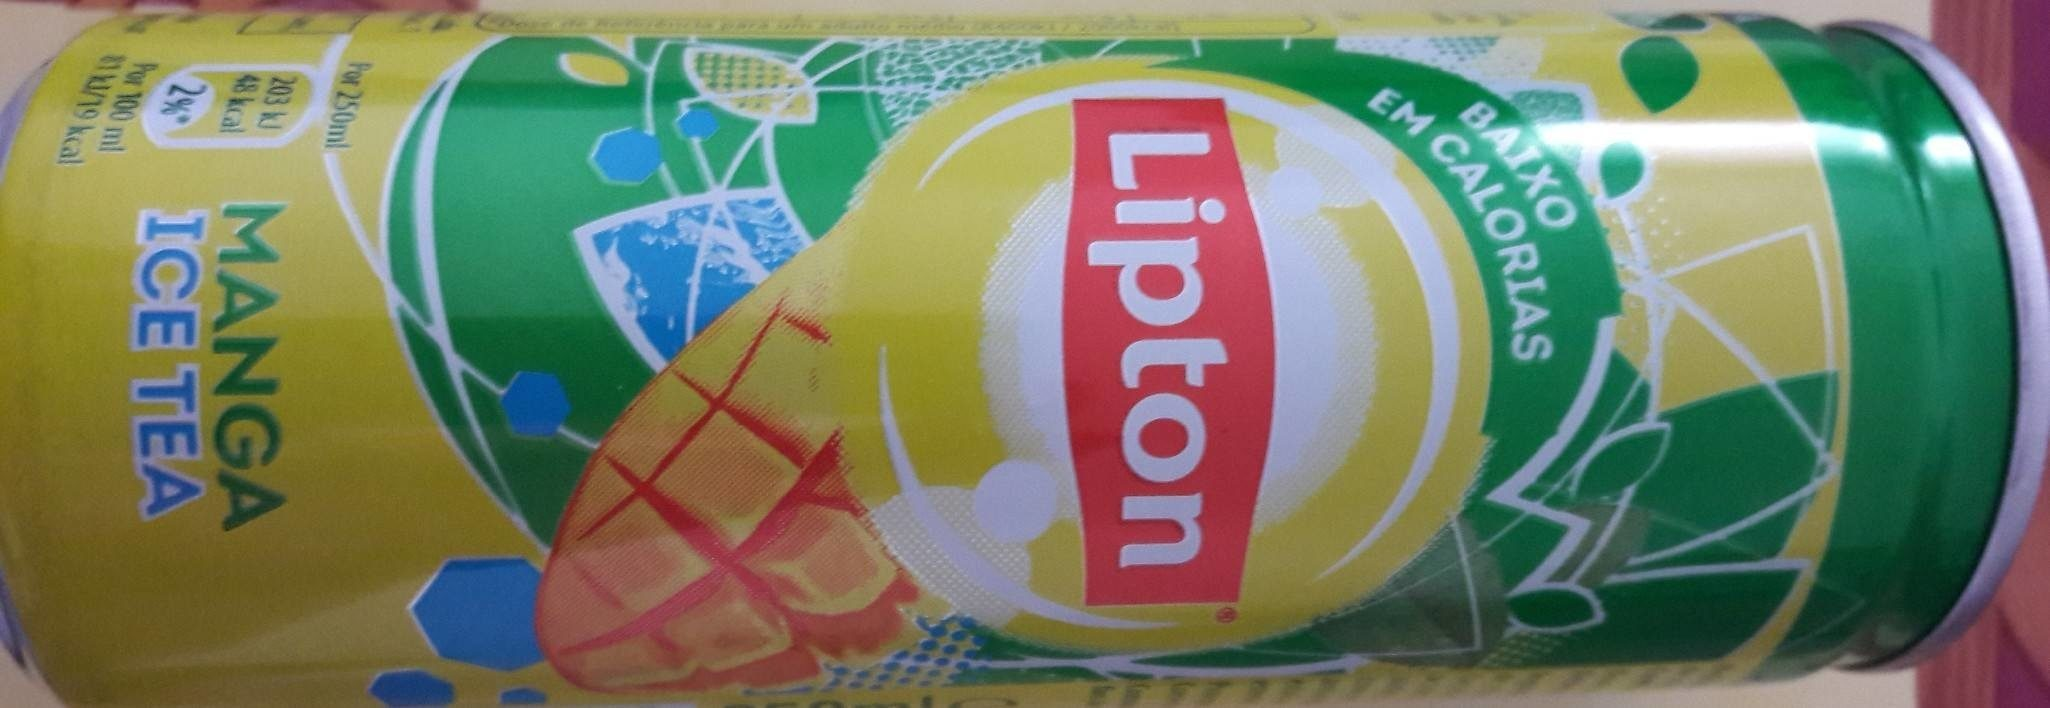 Lipton-ice Tea -mango-250ml-portugal - Nutrition facts - fr